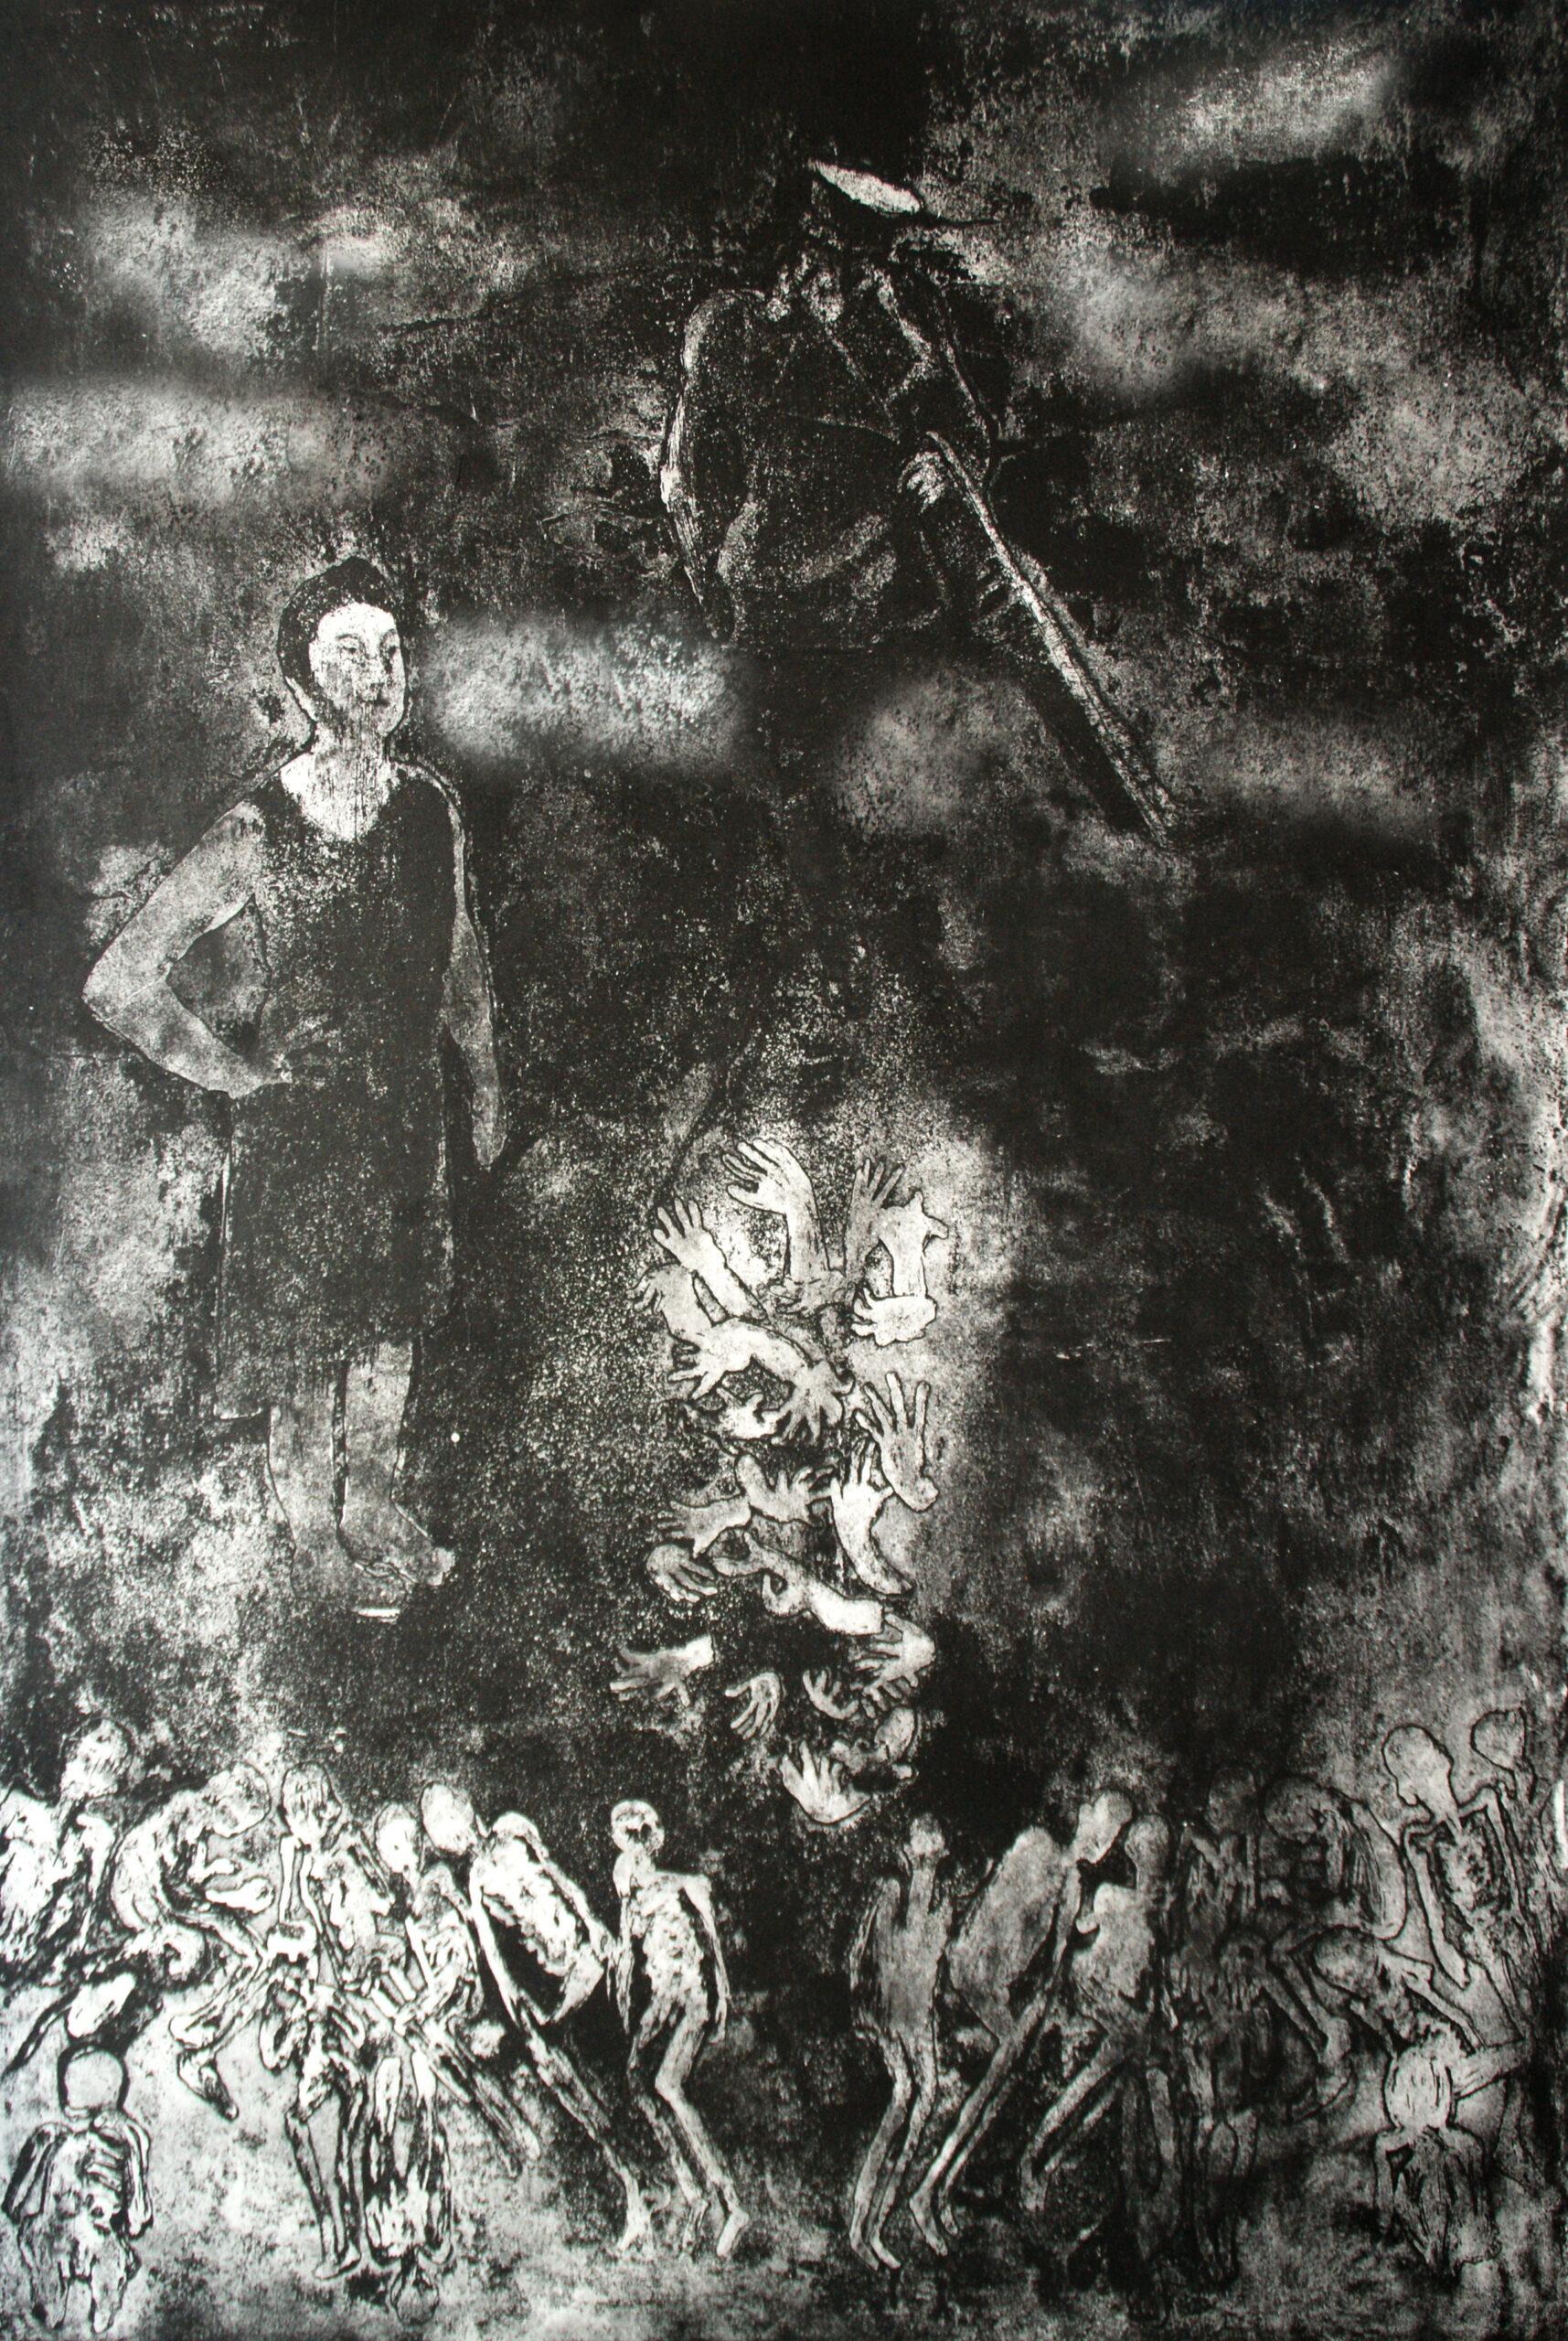 Exiles Art print from Marina Provatidou